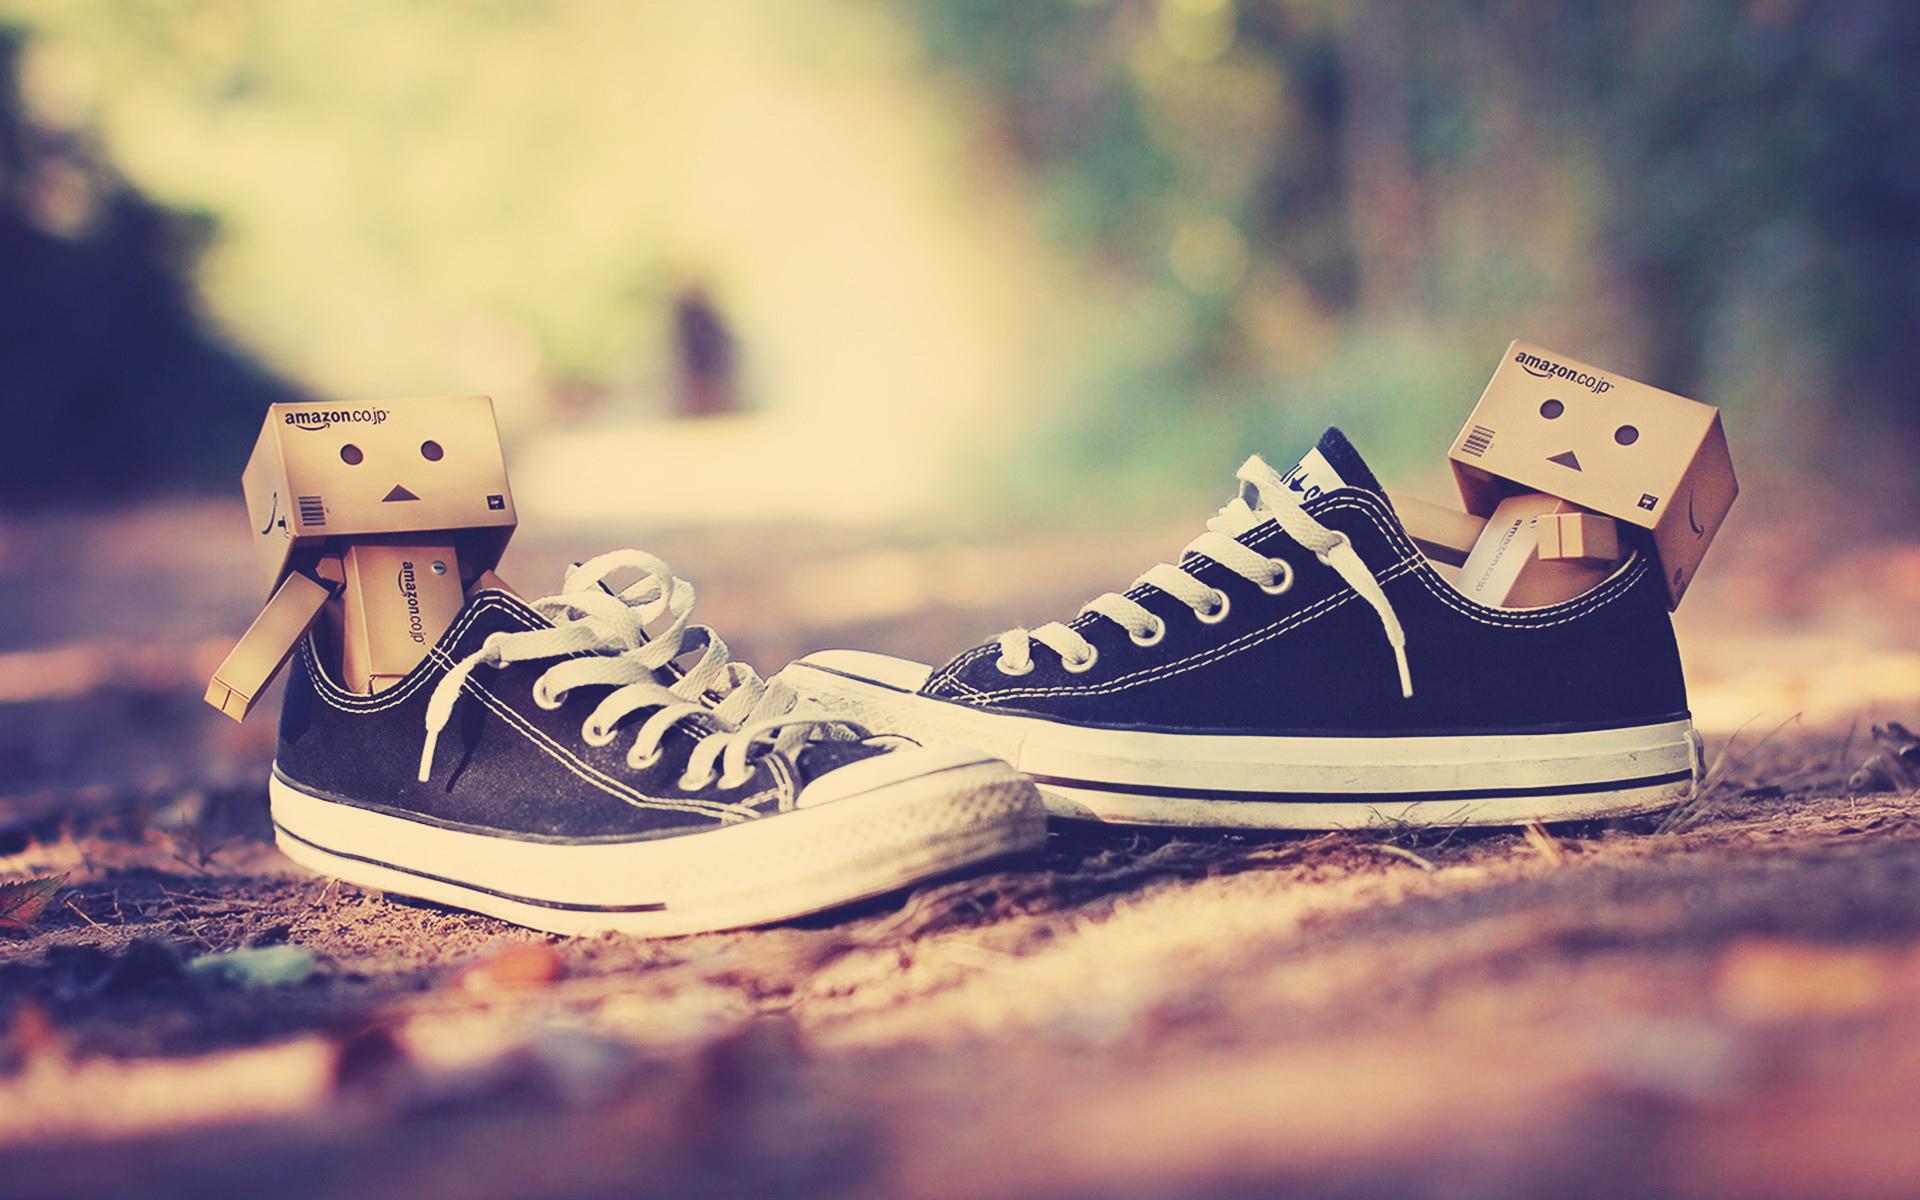 Danboard in the Sneakers 2013-10-22 | Hits: 788